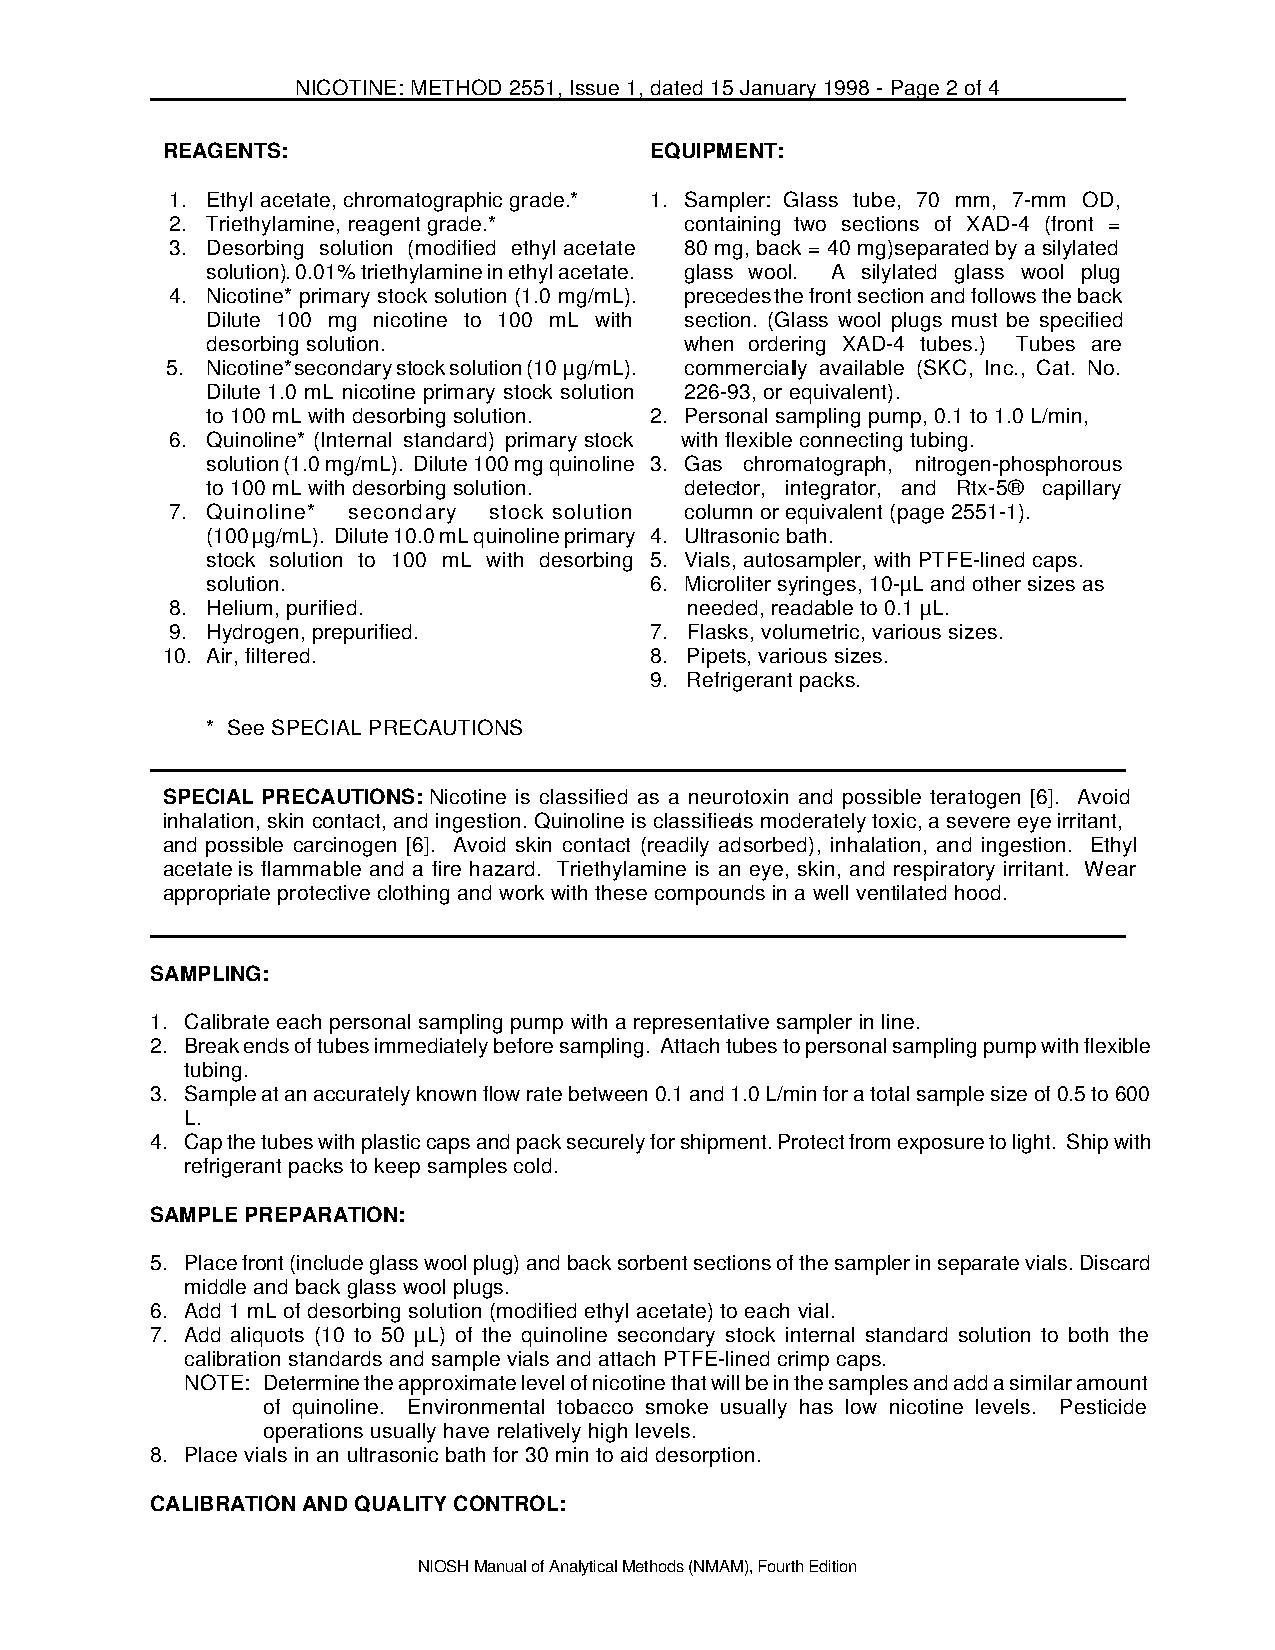 File:NIOSH Manual of Analytical Methods - 2551.pdf - Wikimedia Commons